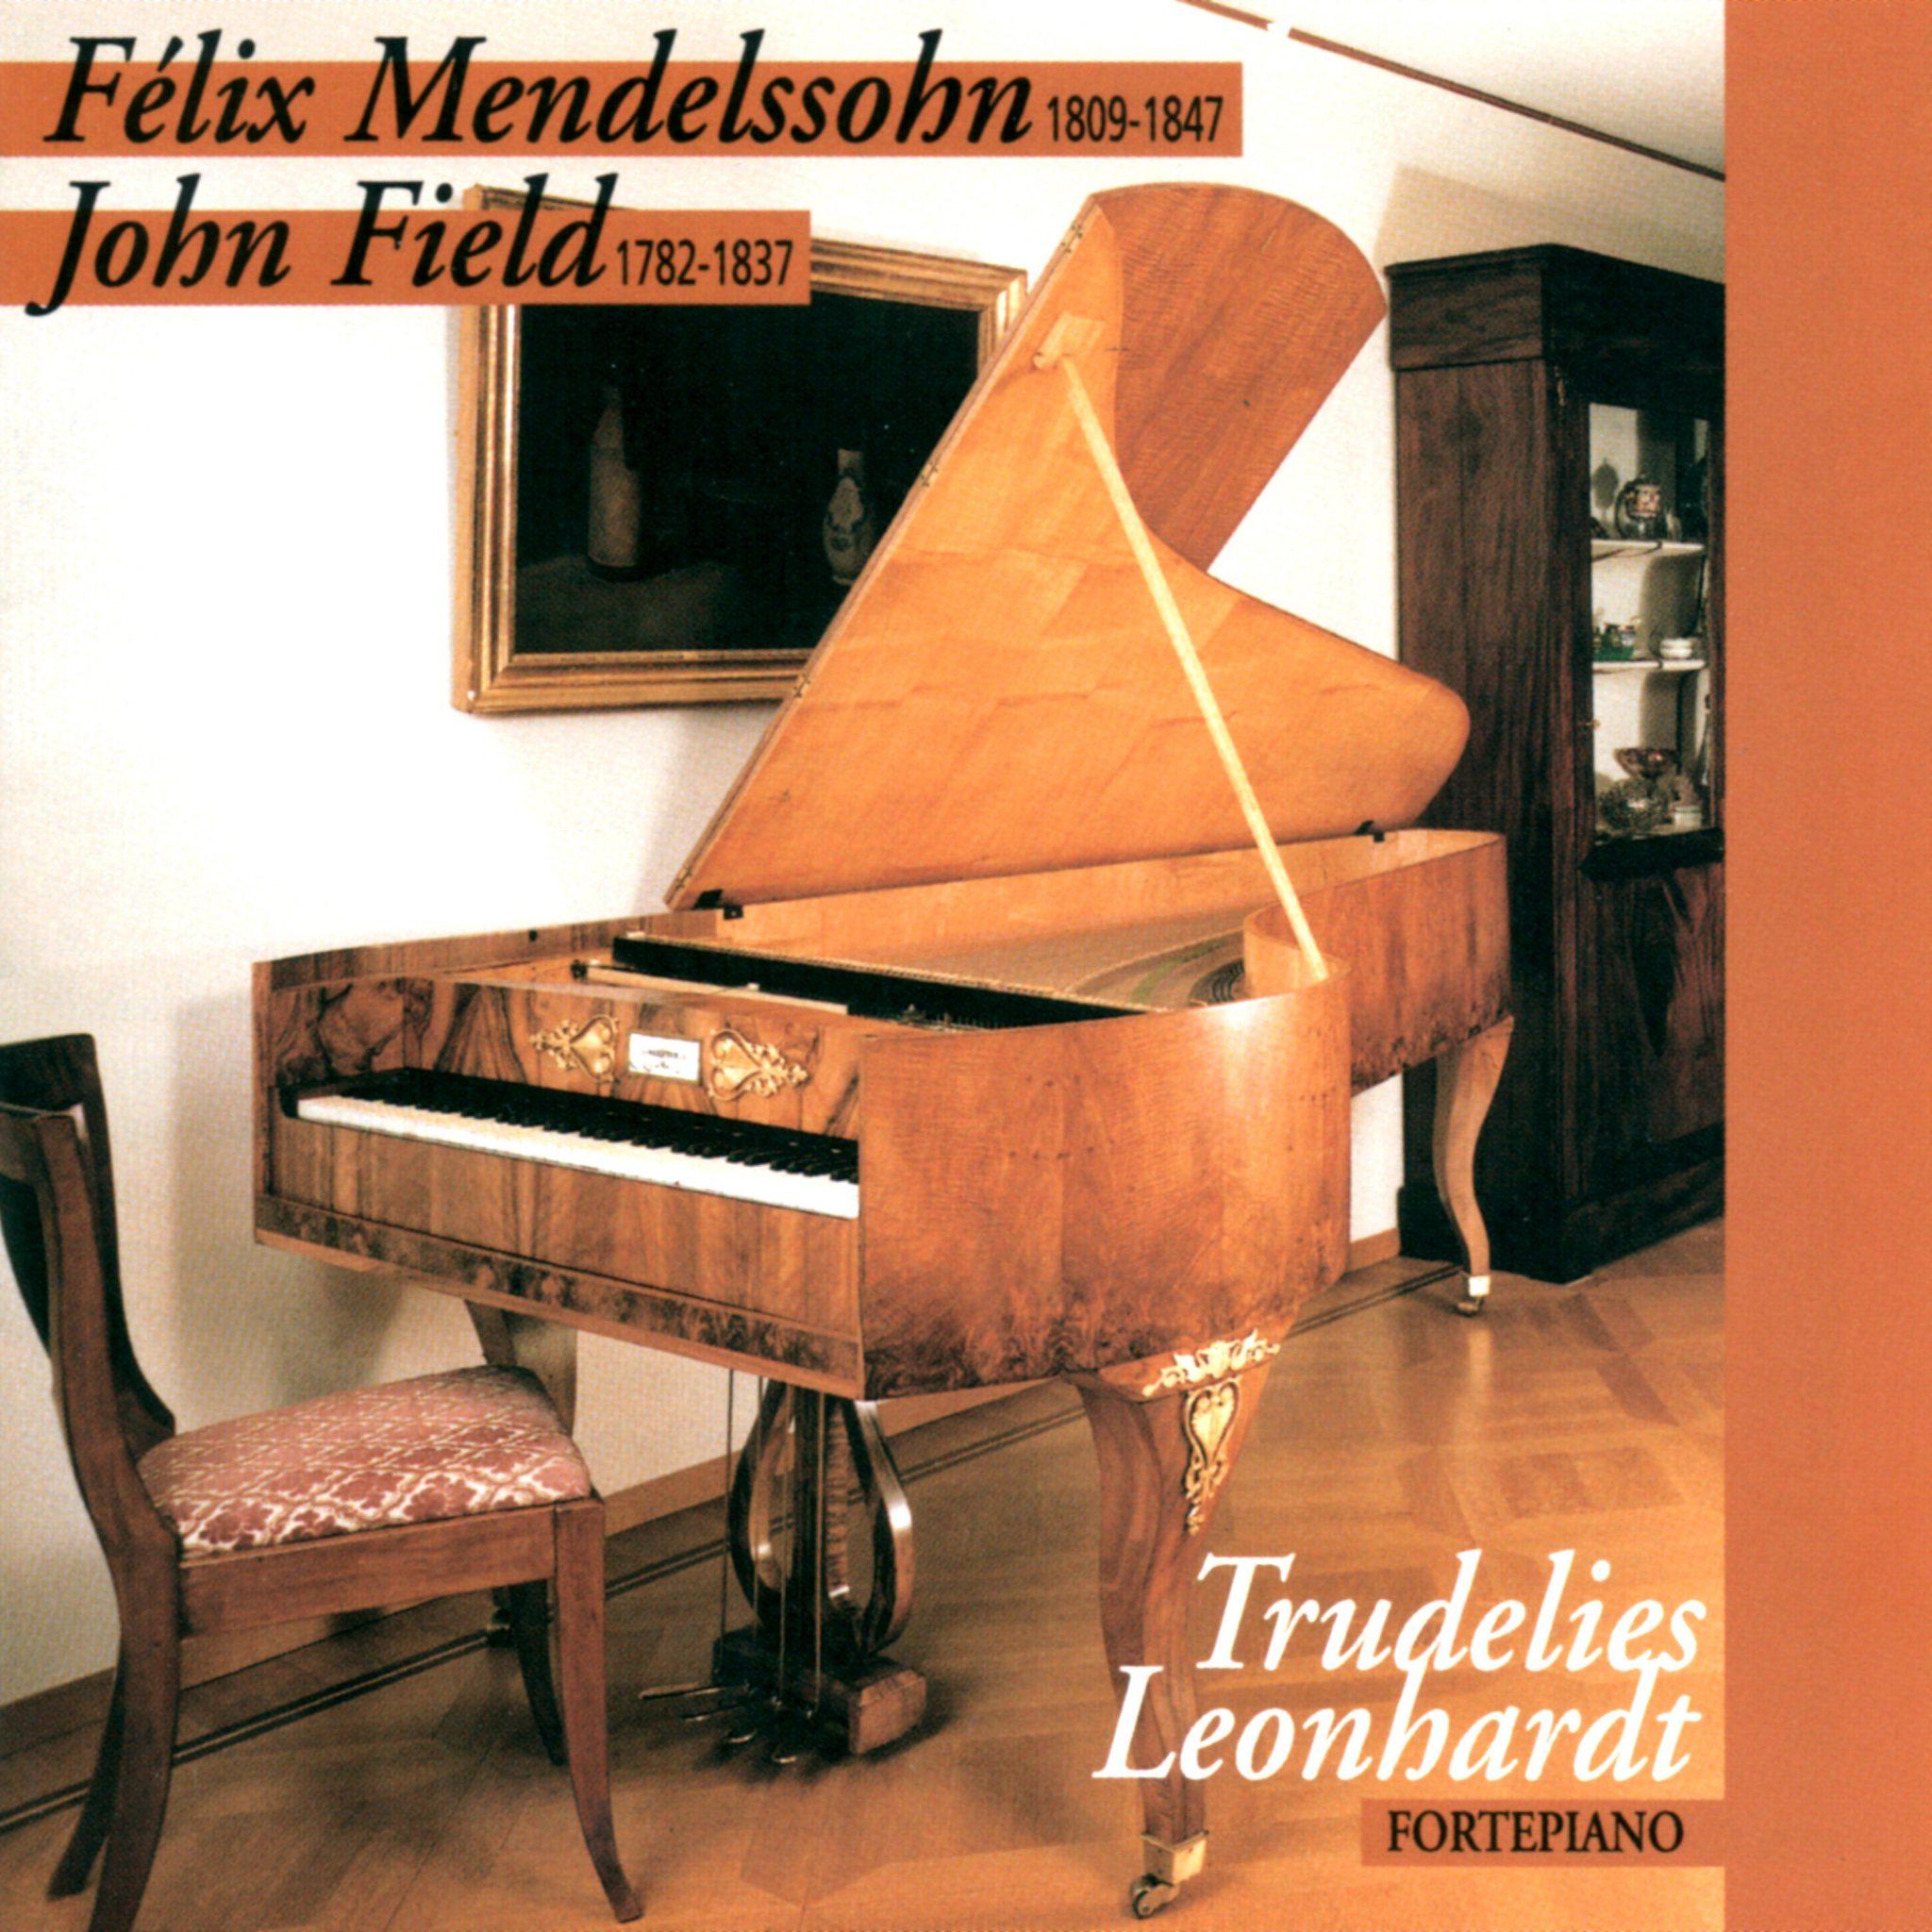 Felix Mendelssohn - John Field - Trudelies Leonhardt - Fortepiano